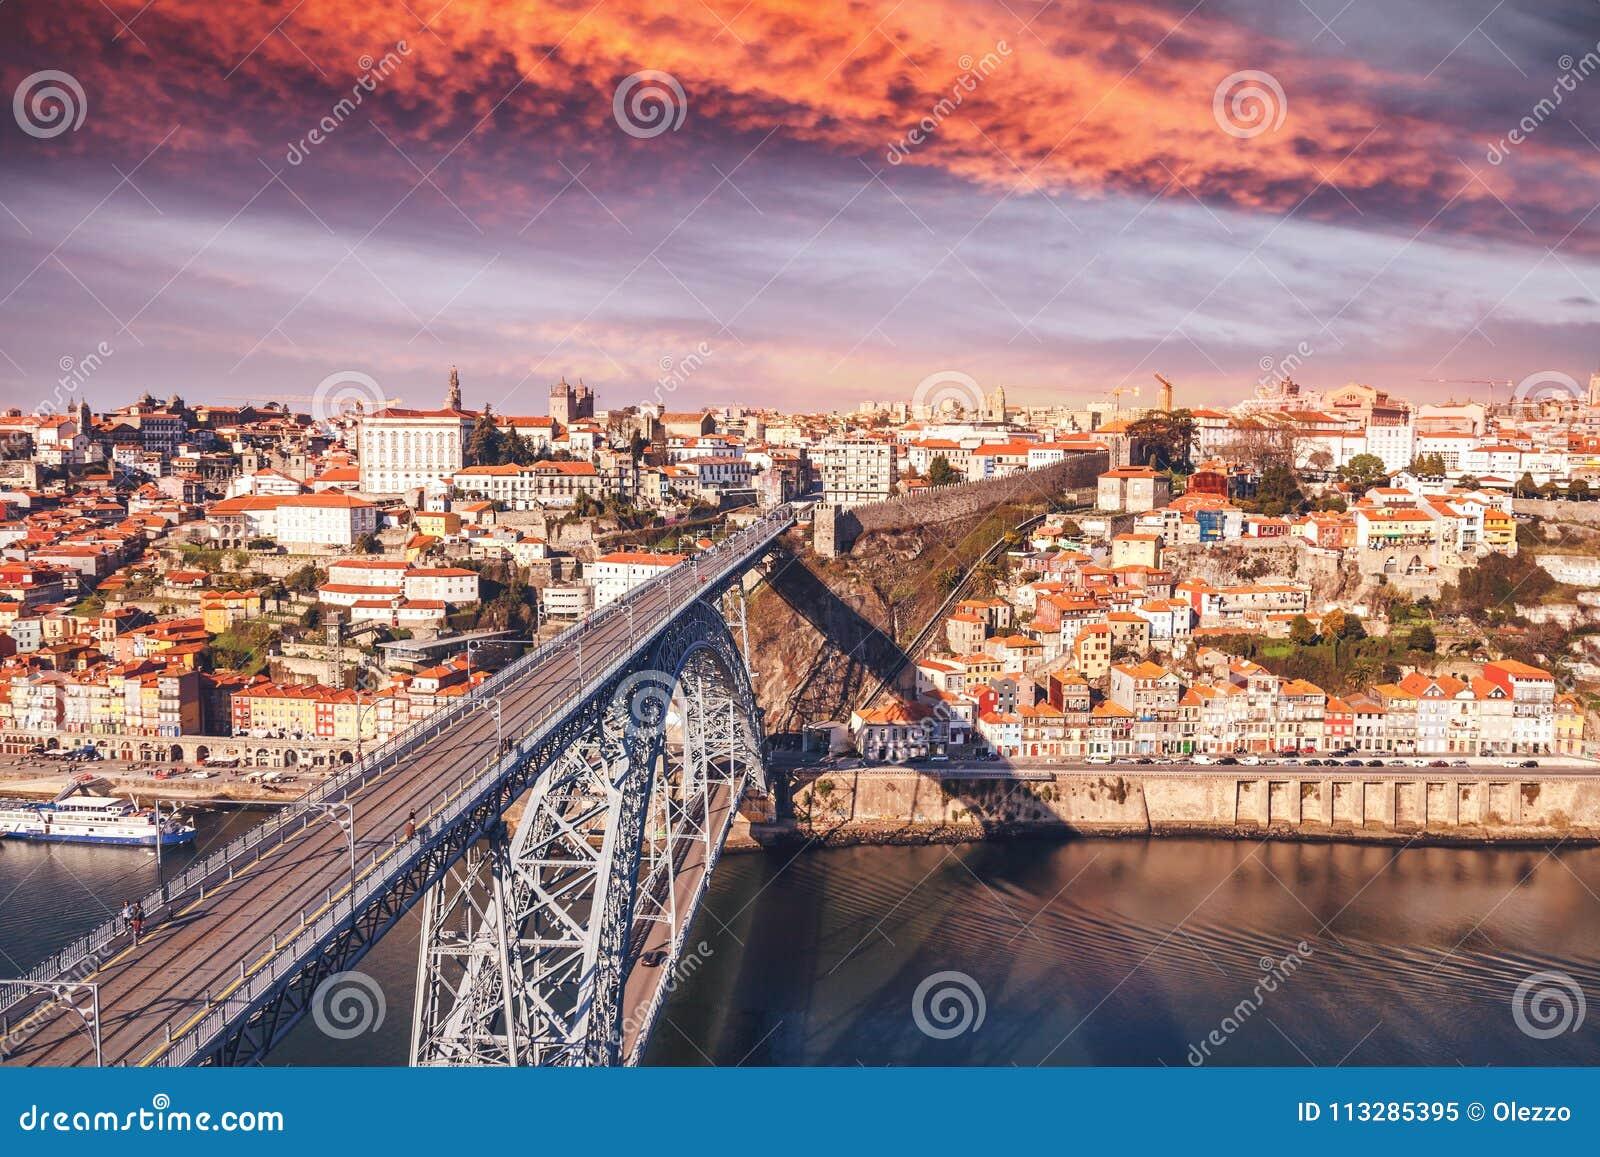 Porto, Portugal oude stadshorizon bij zonsondergang, mooie cityscape